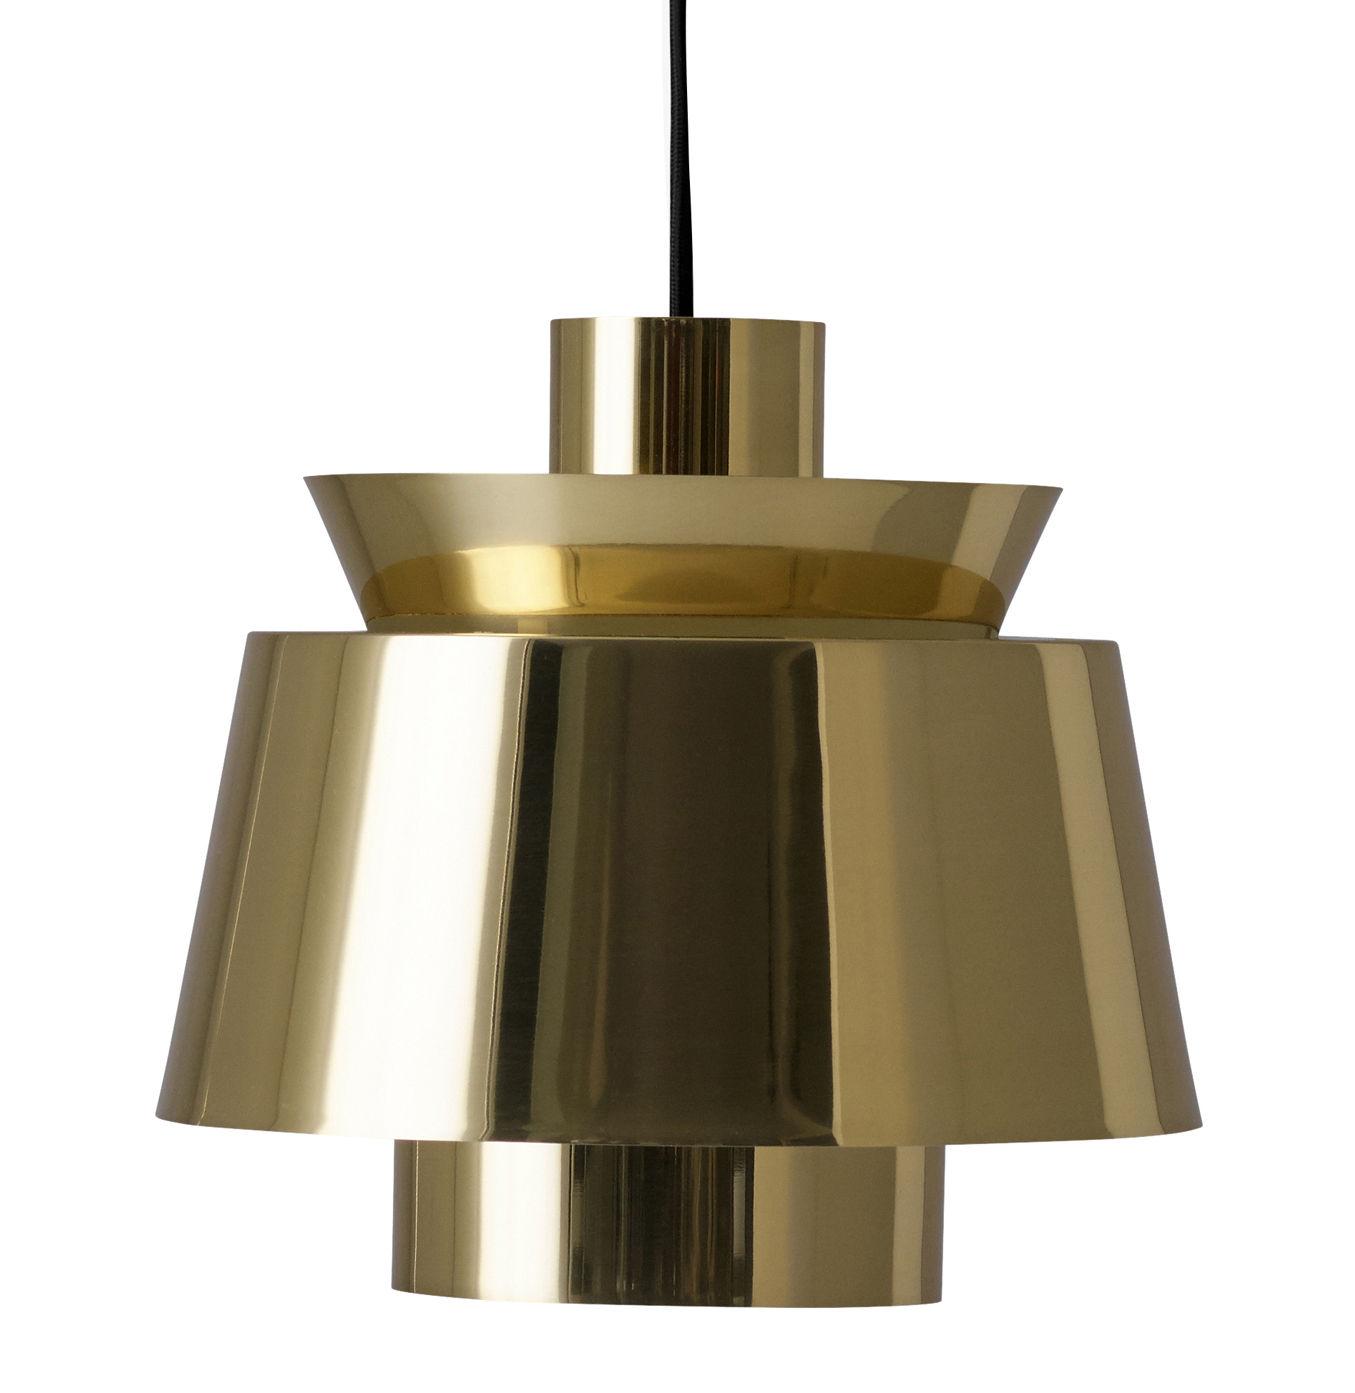 Lighting - Pendant Lighting - Utzon Pendant - / 1947 reissue by &tradition - Brass - Polished brass